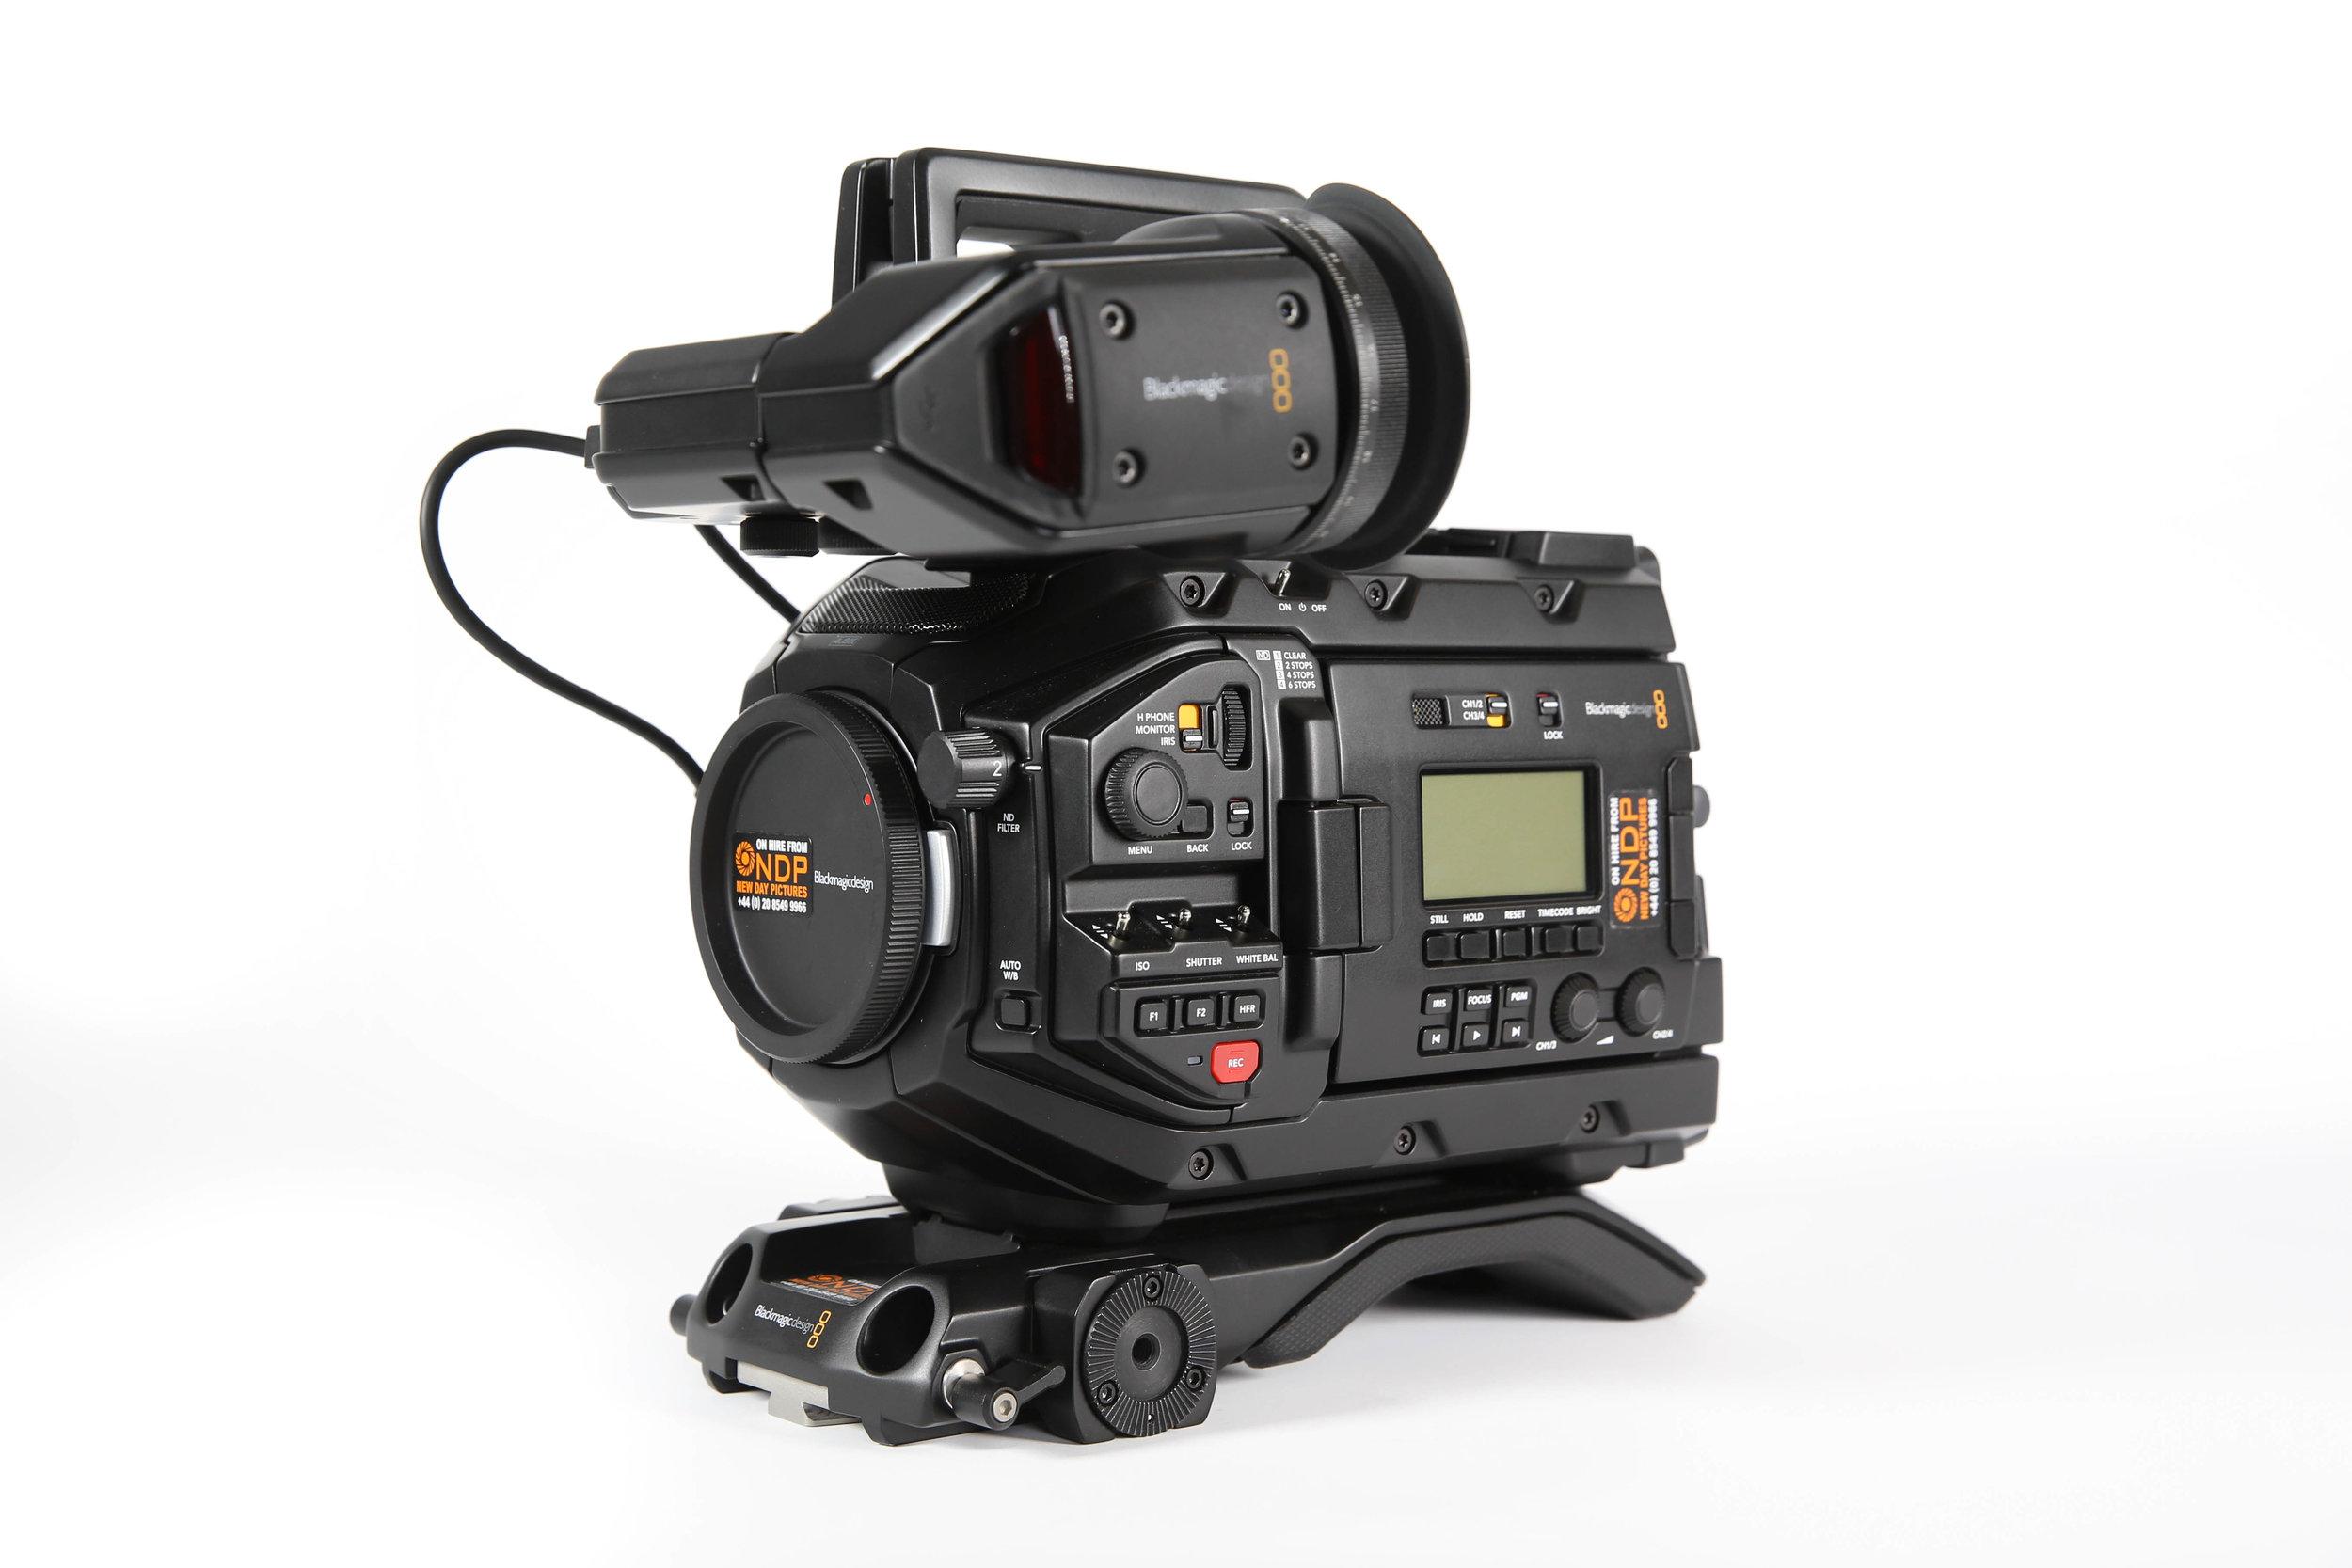 Blackmagic Design URSA Mini PRO 4 6K EF Hire - £150/Day or